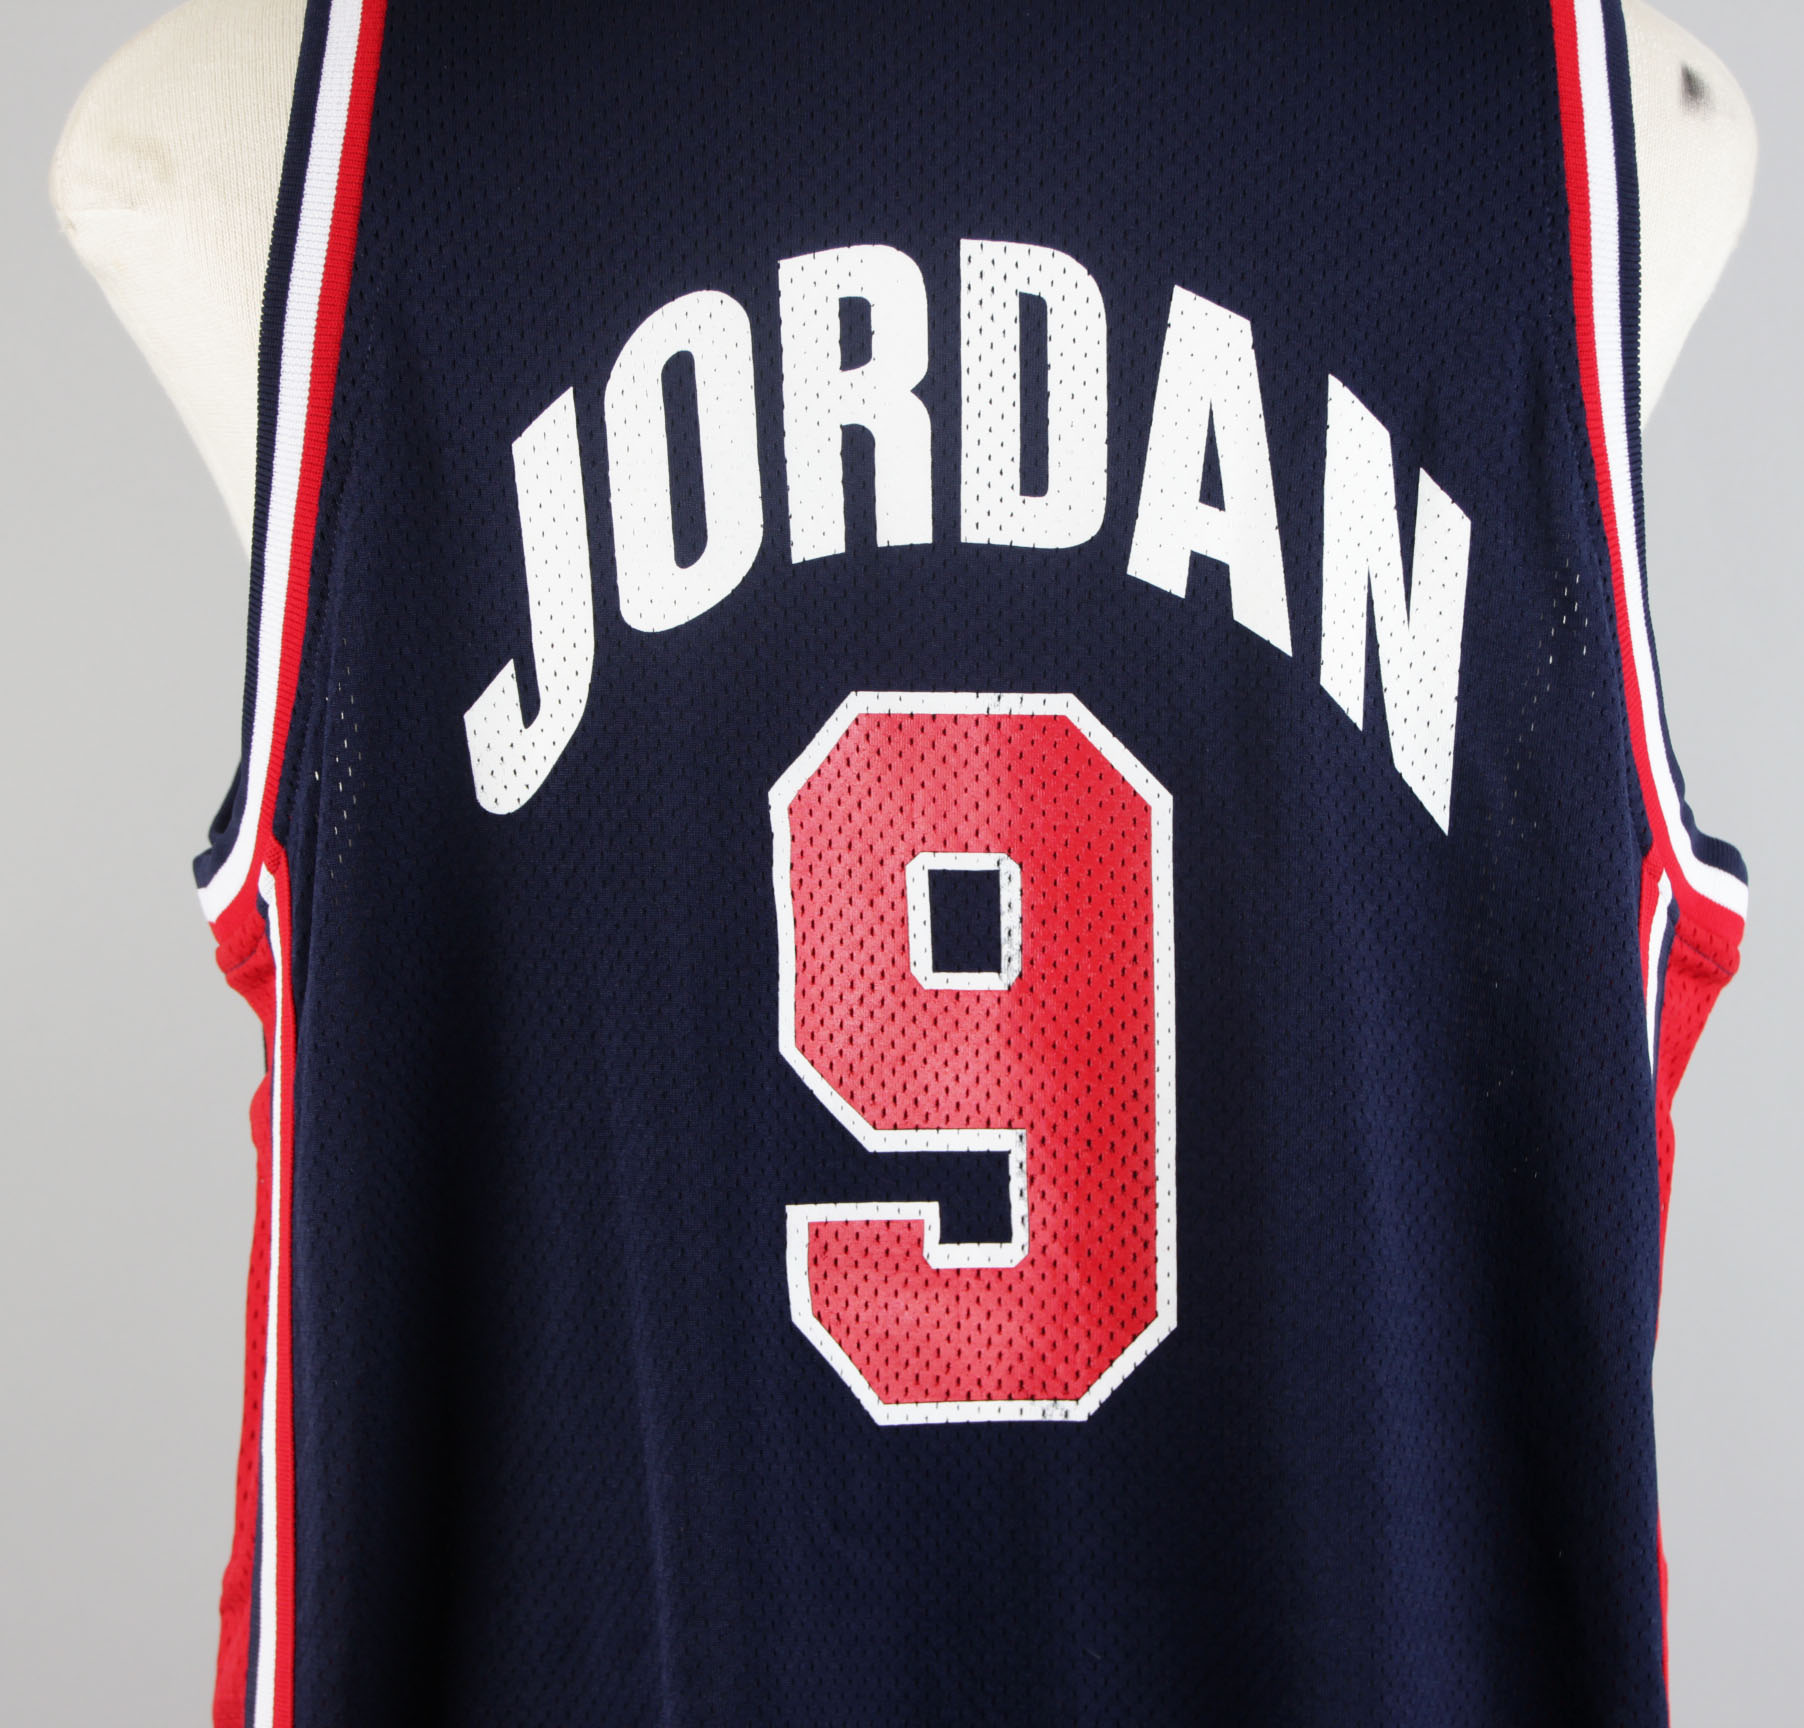 the best attitude ac07d dcb36 michael jordan 1992 olympic jersey